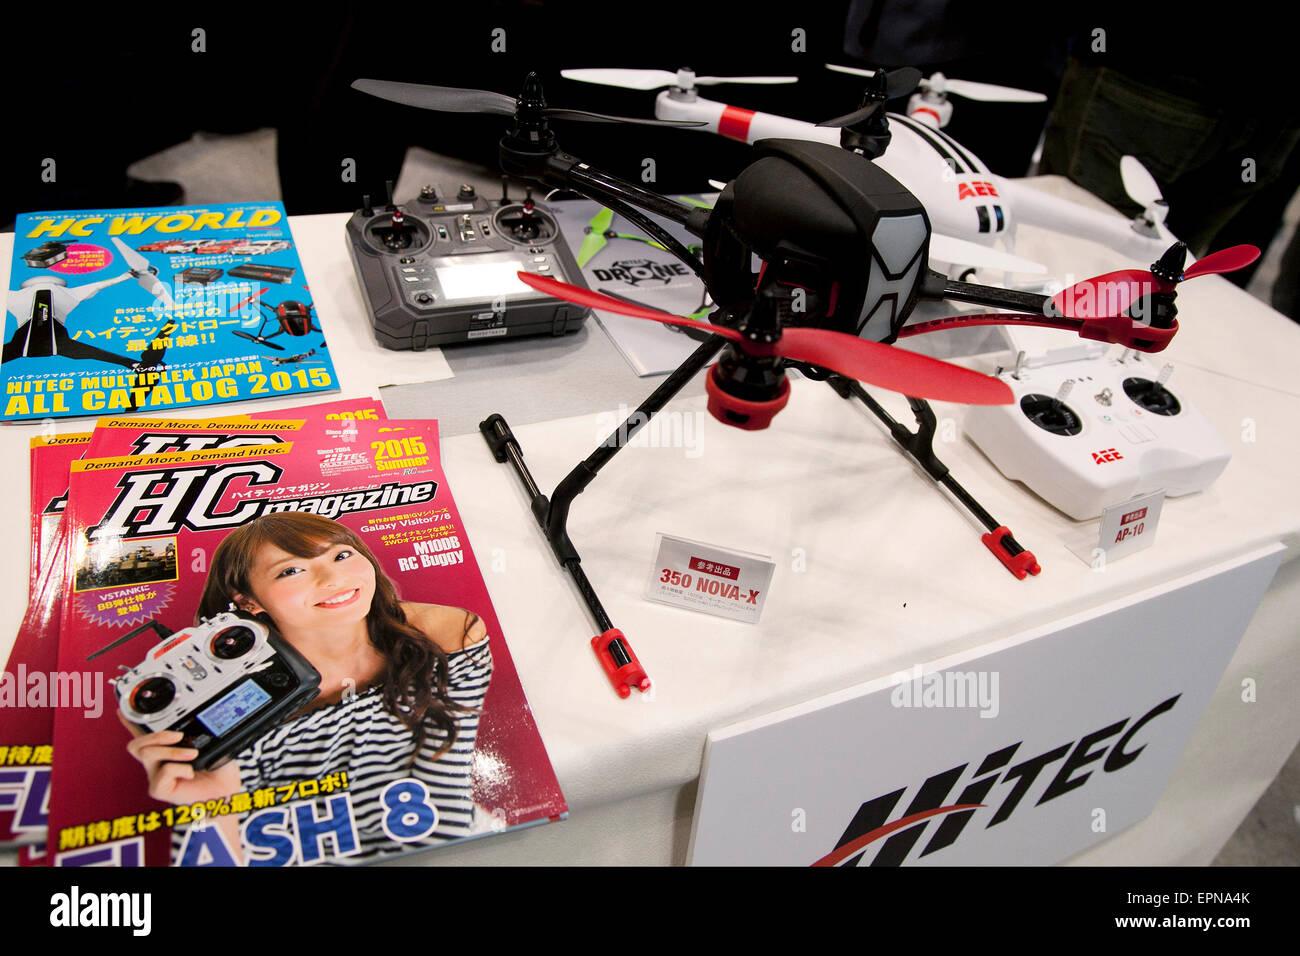 dronex pro montage